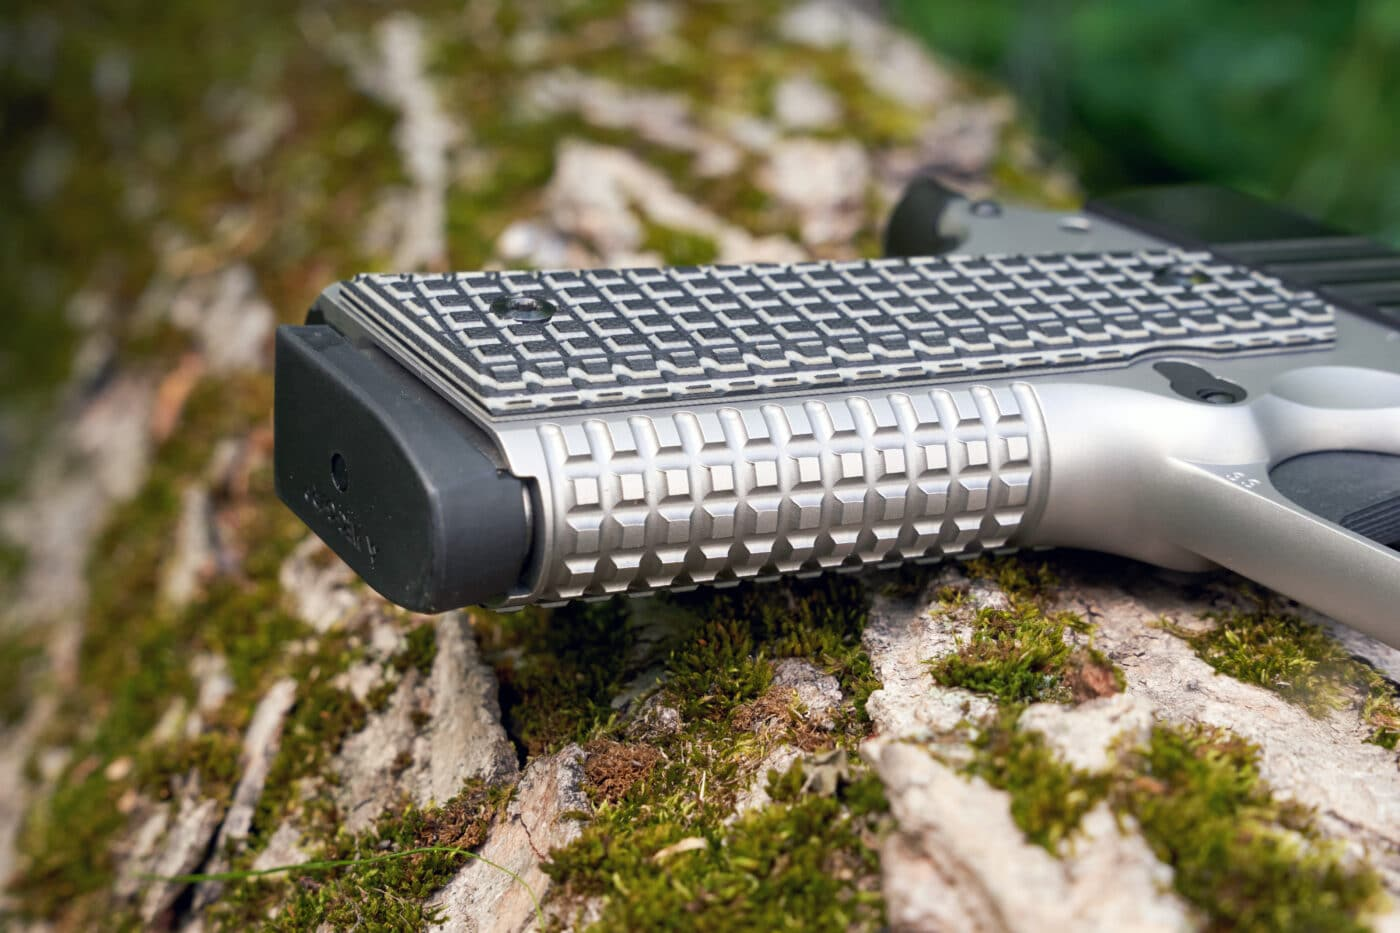 G10 grip panels on Springfield Emissary pistol